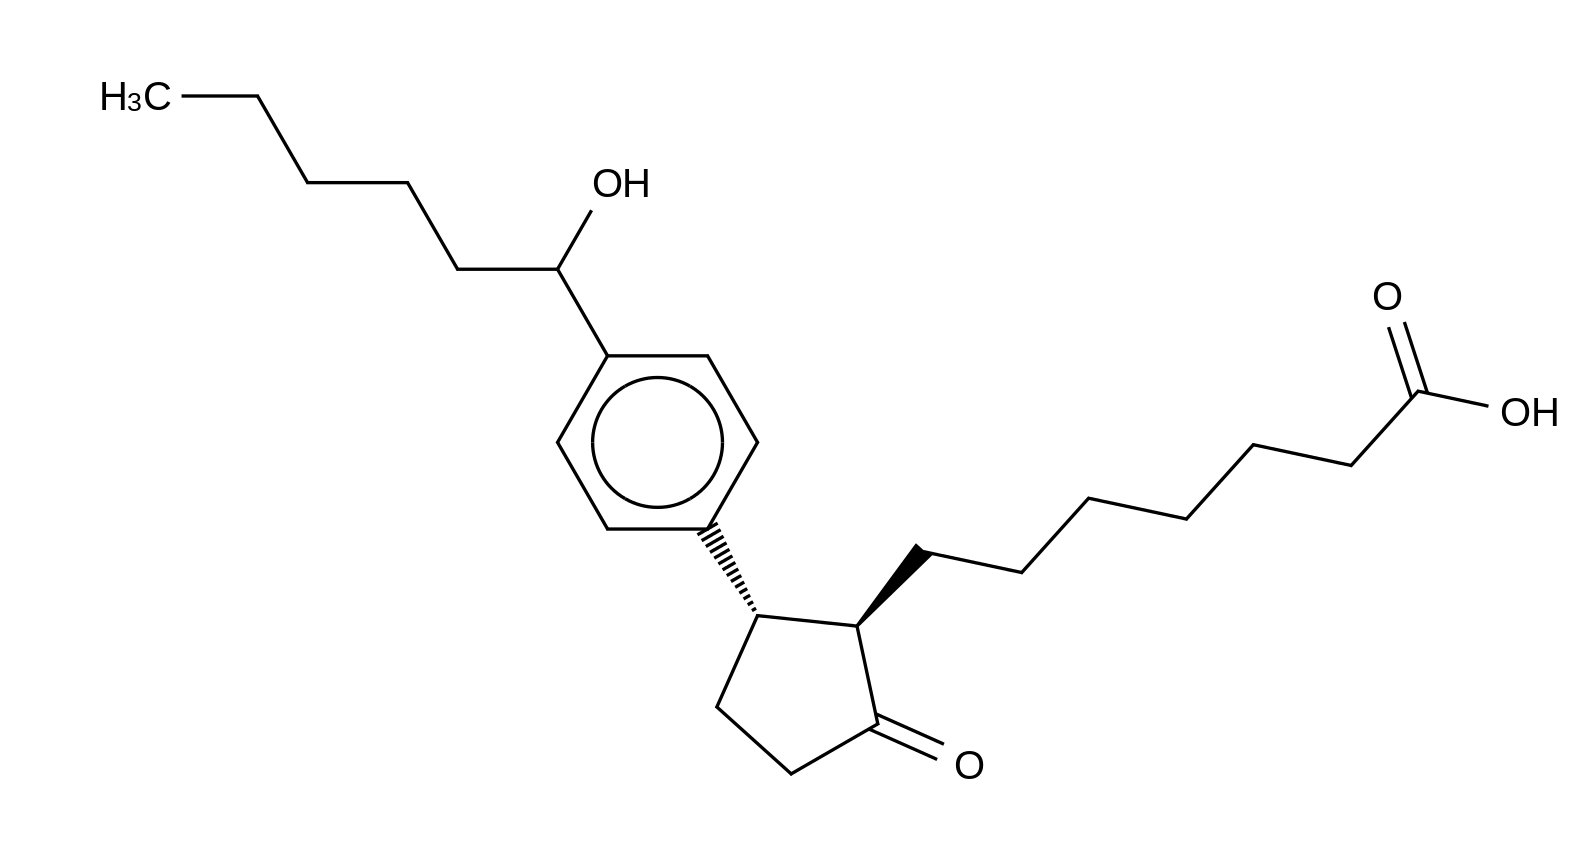 AH 13205